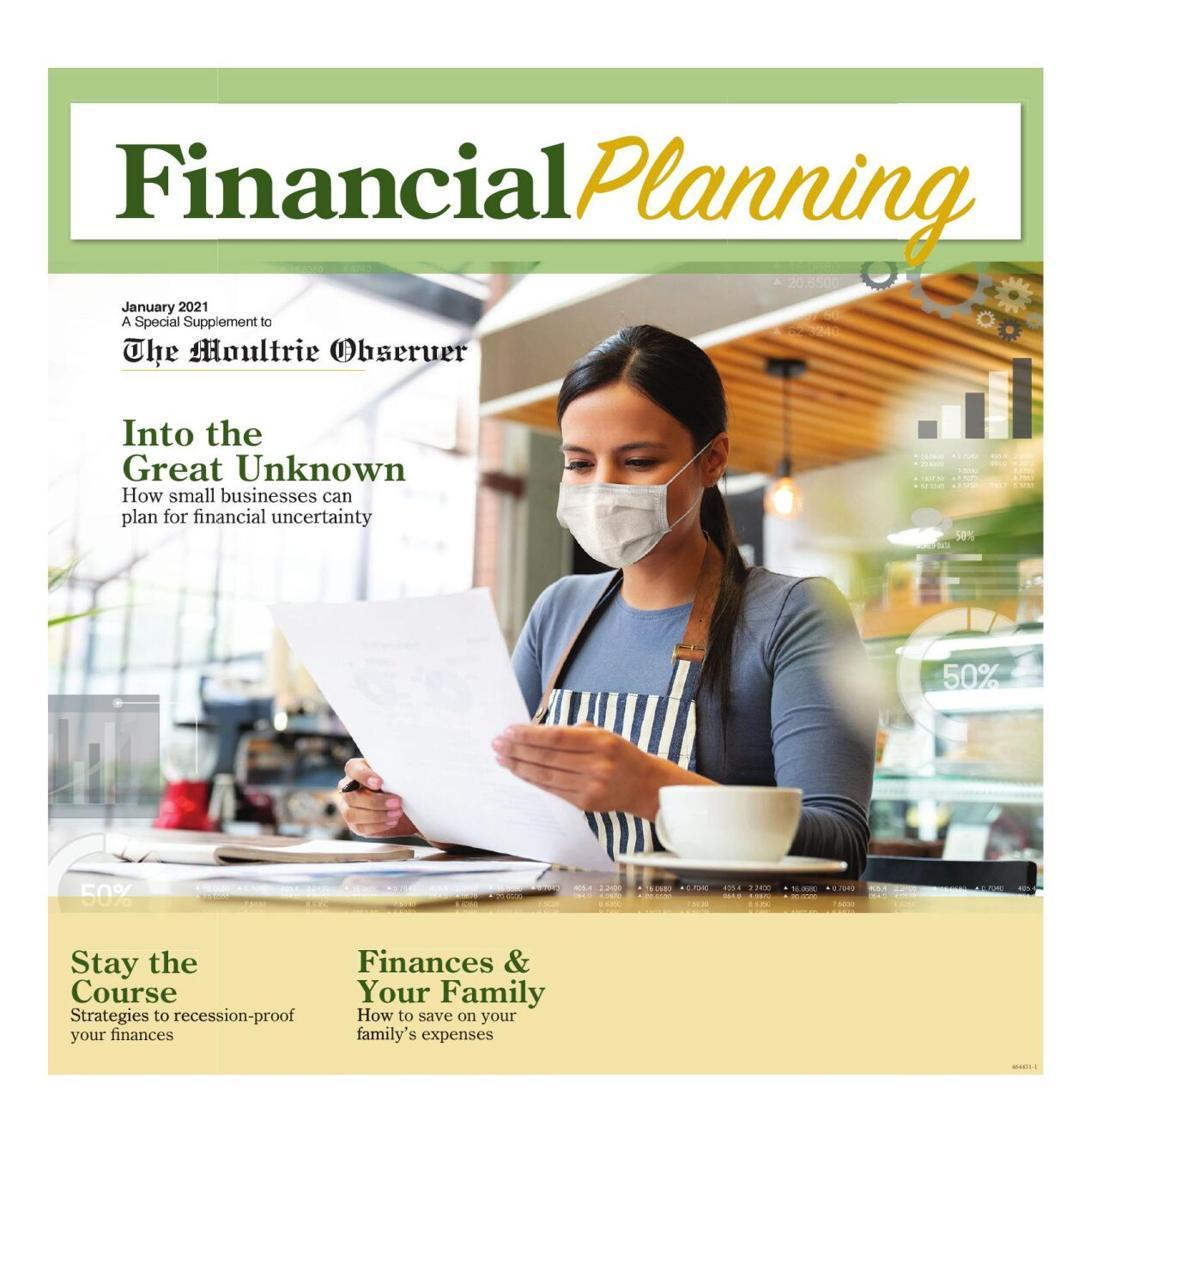 Financial Planning, 2021